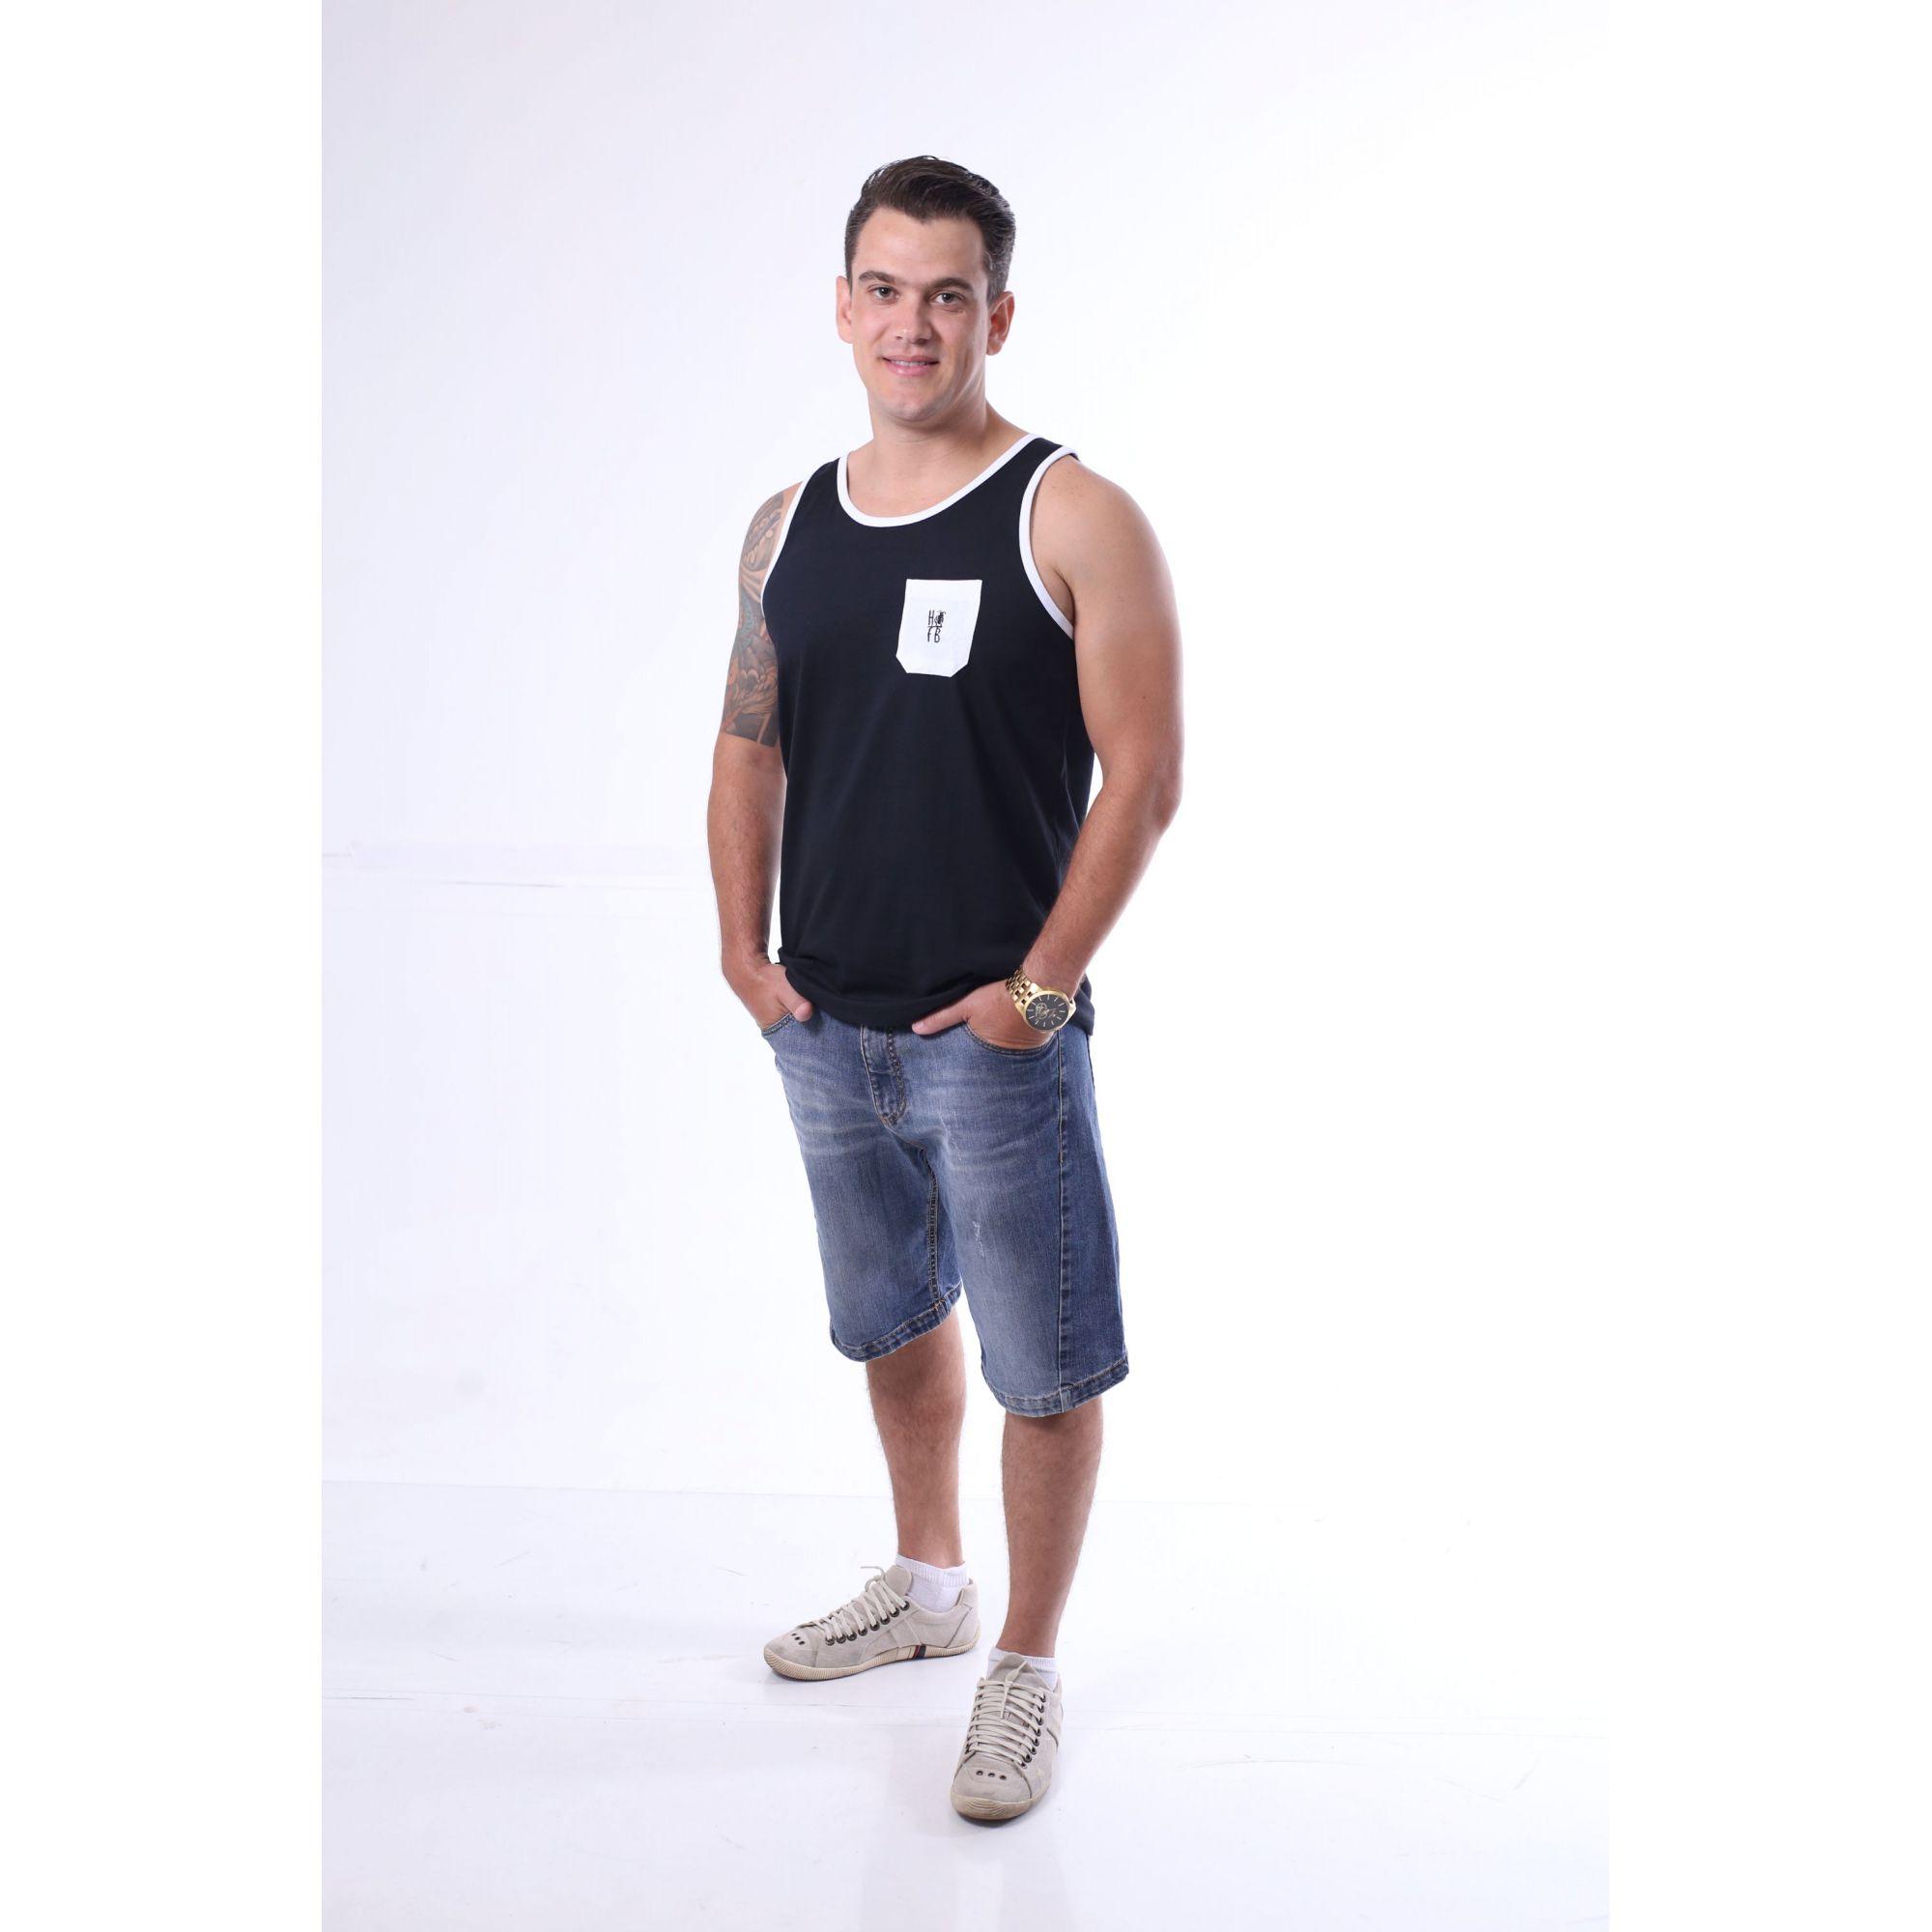 Regata Masculina Preta com Bolso Branco  - Heitor Fashion Brazil